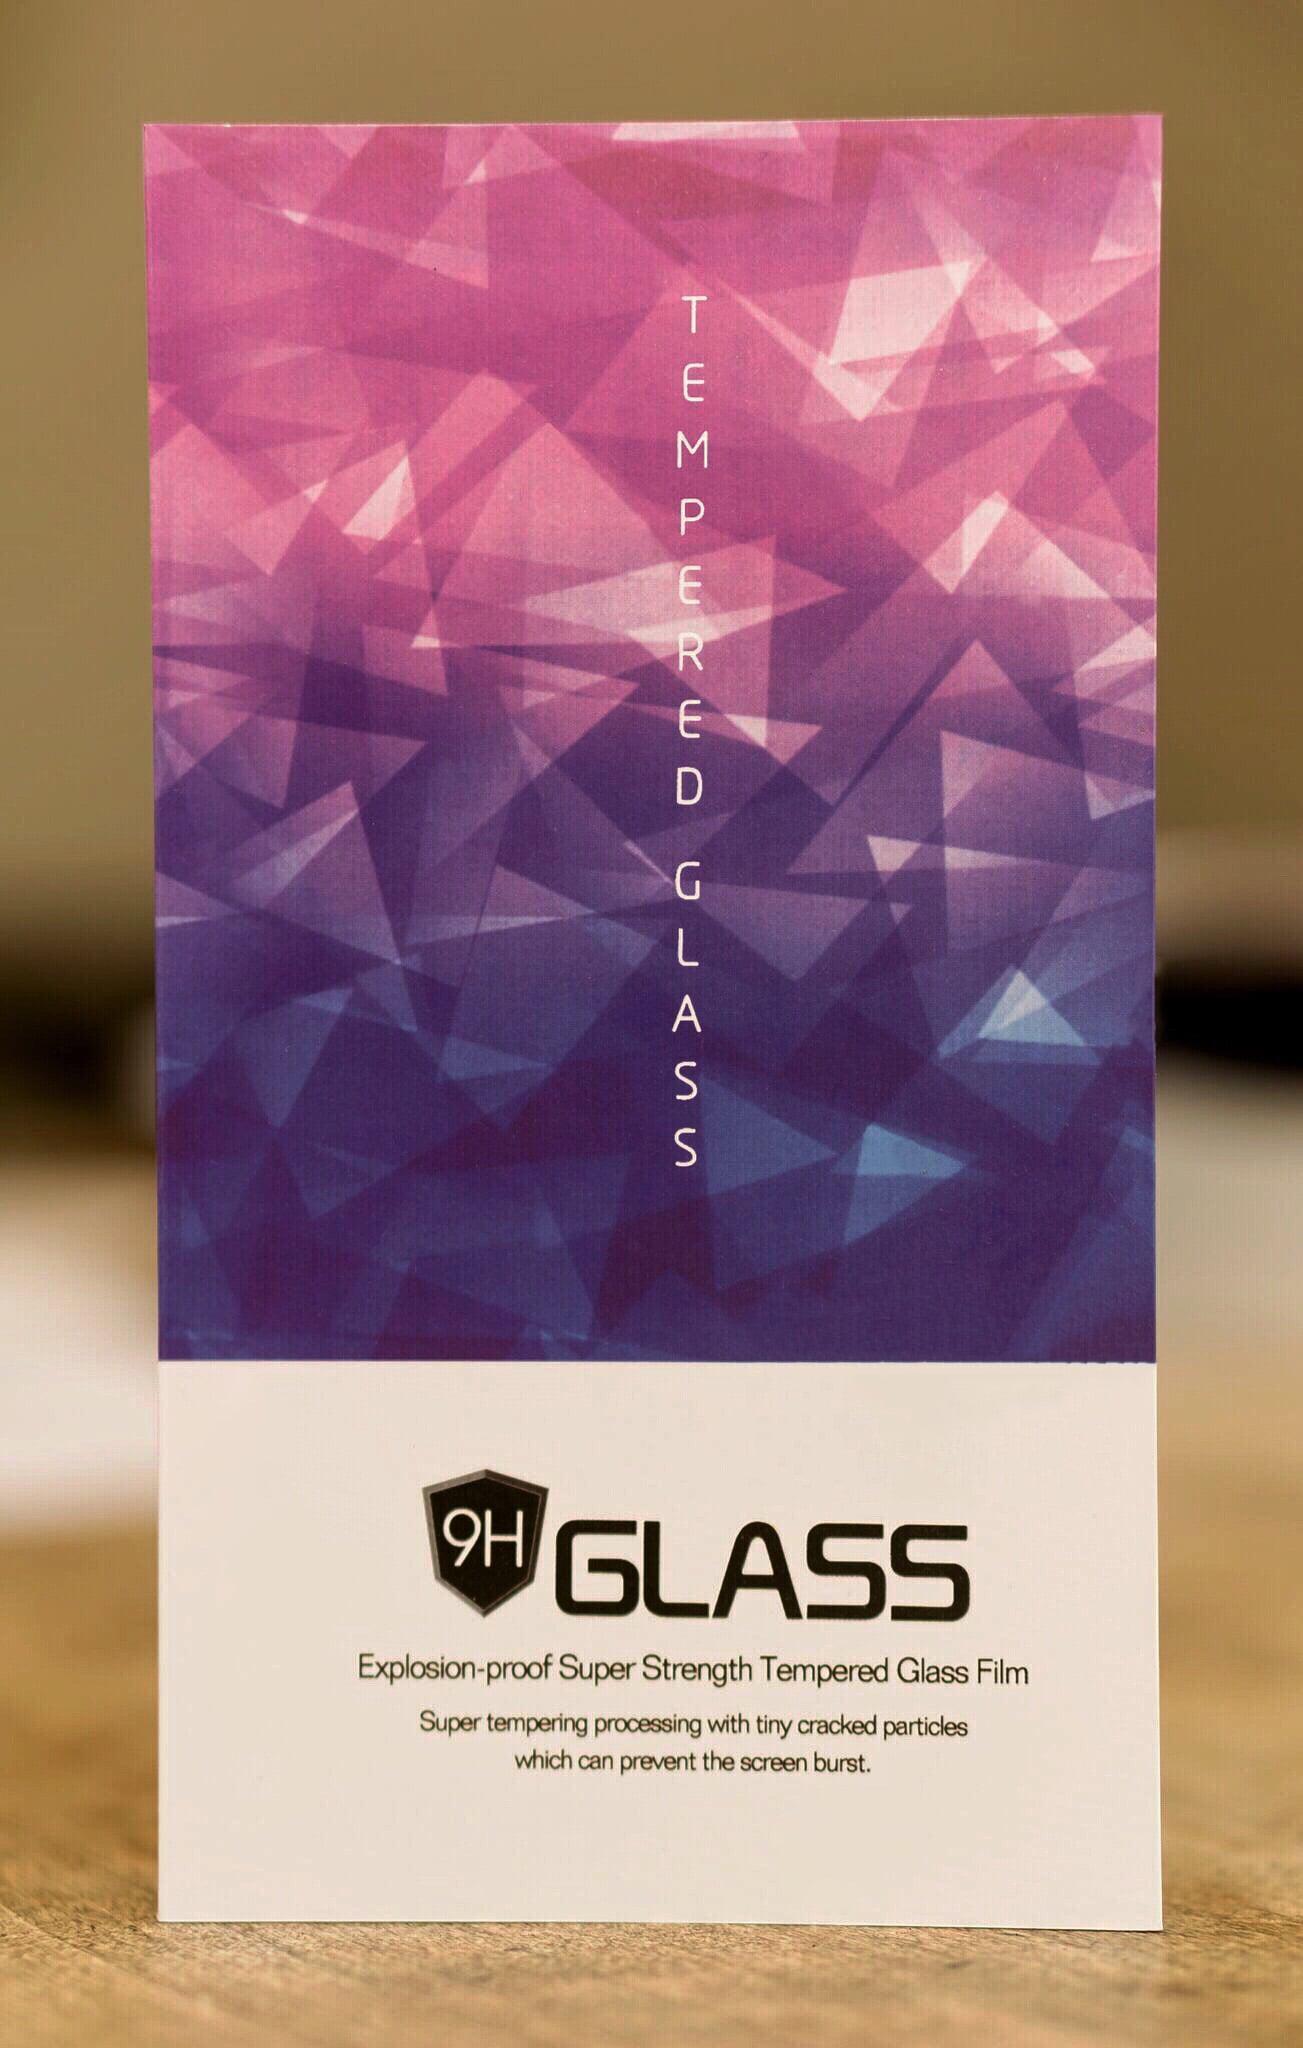 Tempered glass Samsung Gear S3